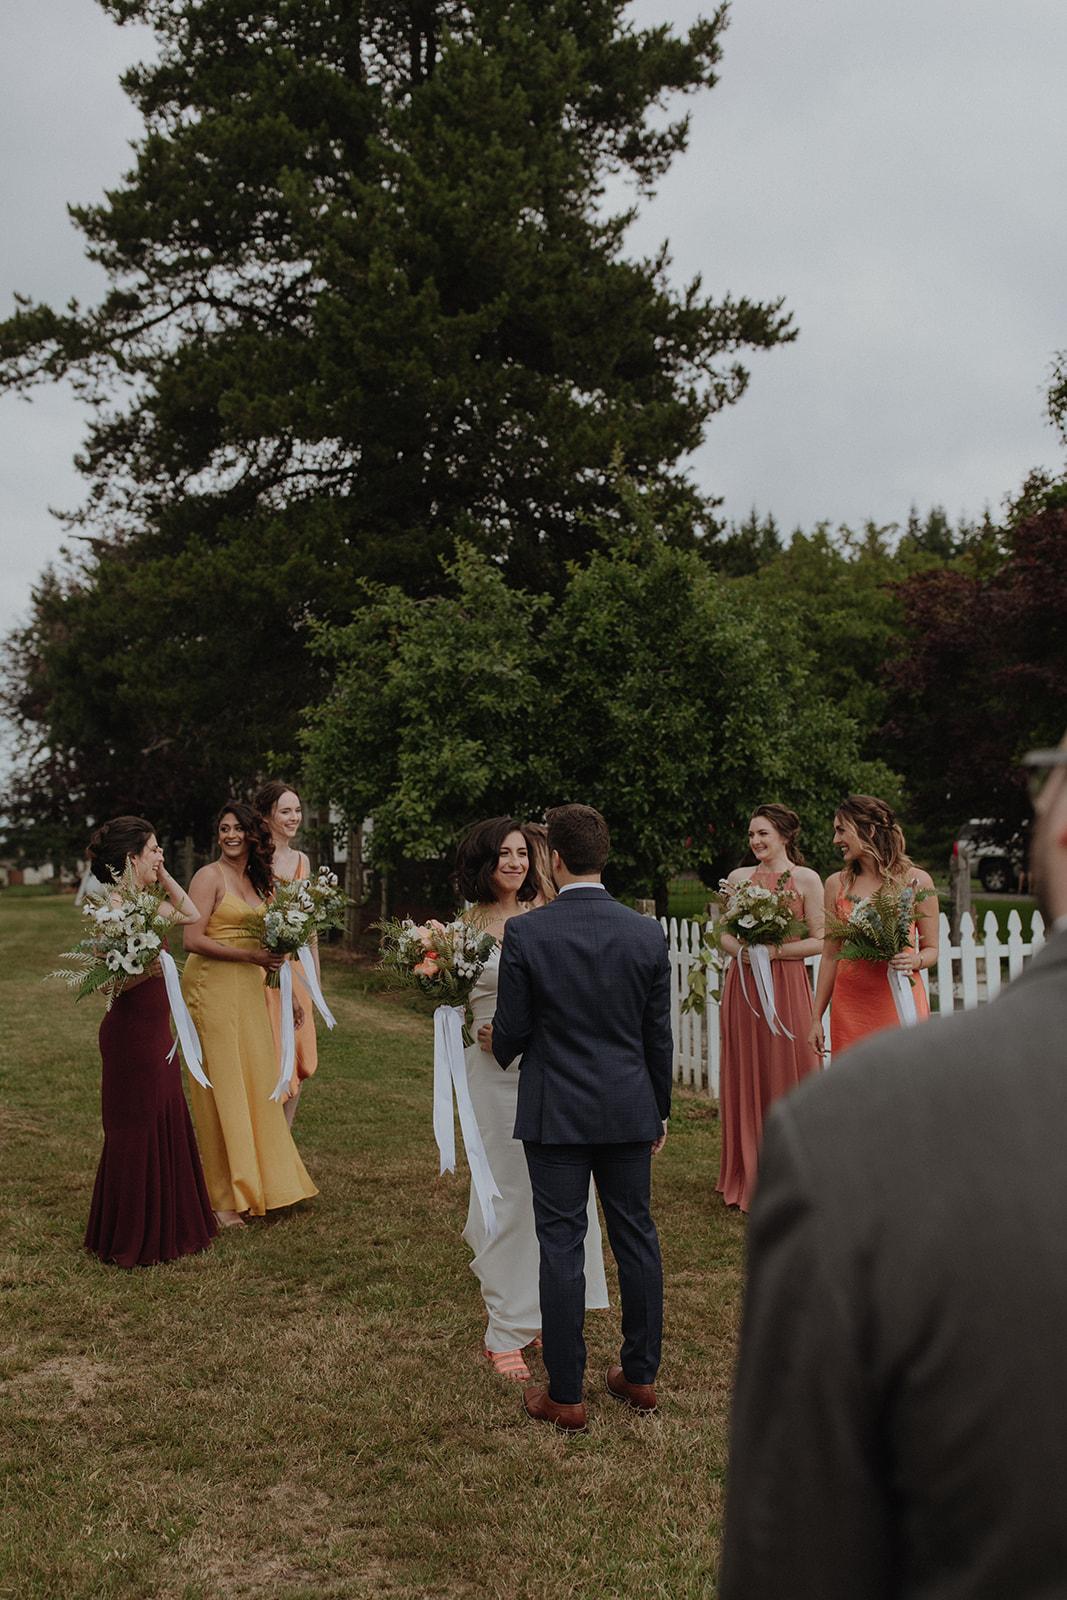 cortney_skye_wedding_june2019-185.jpg